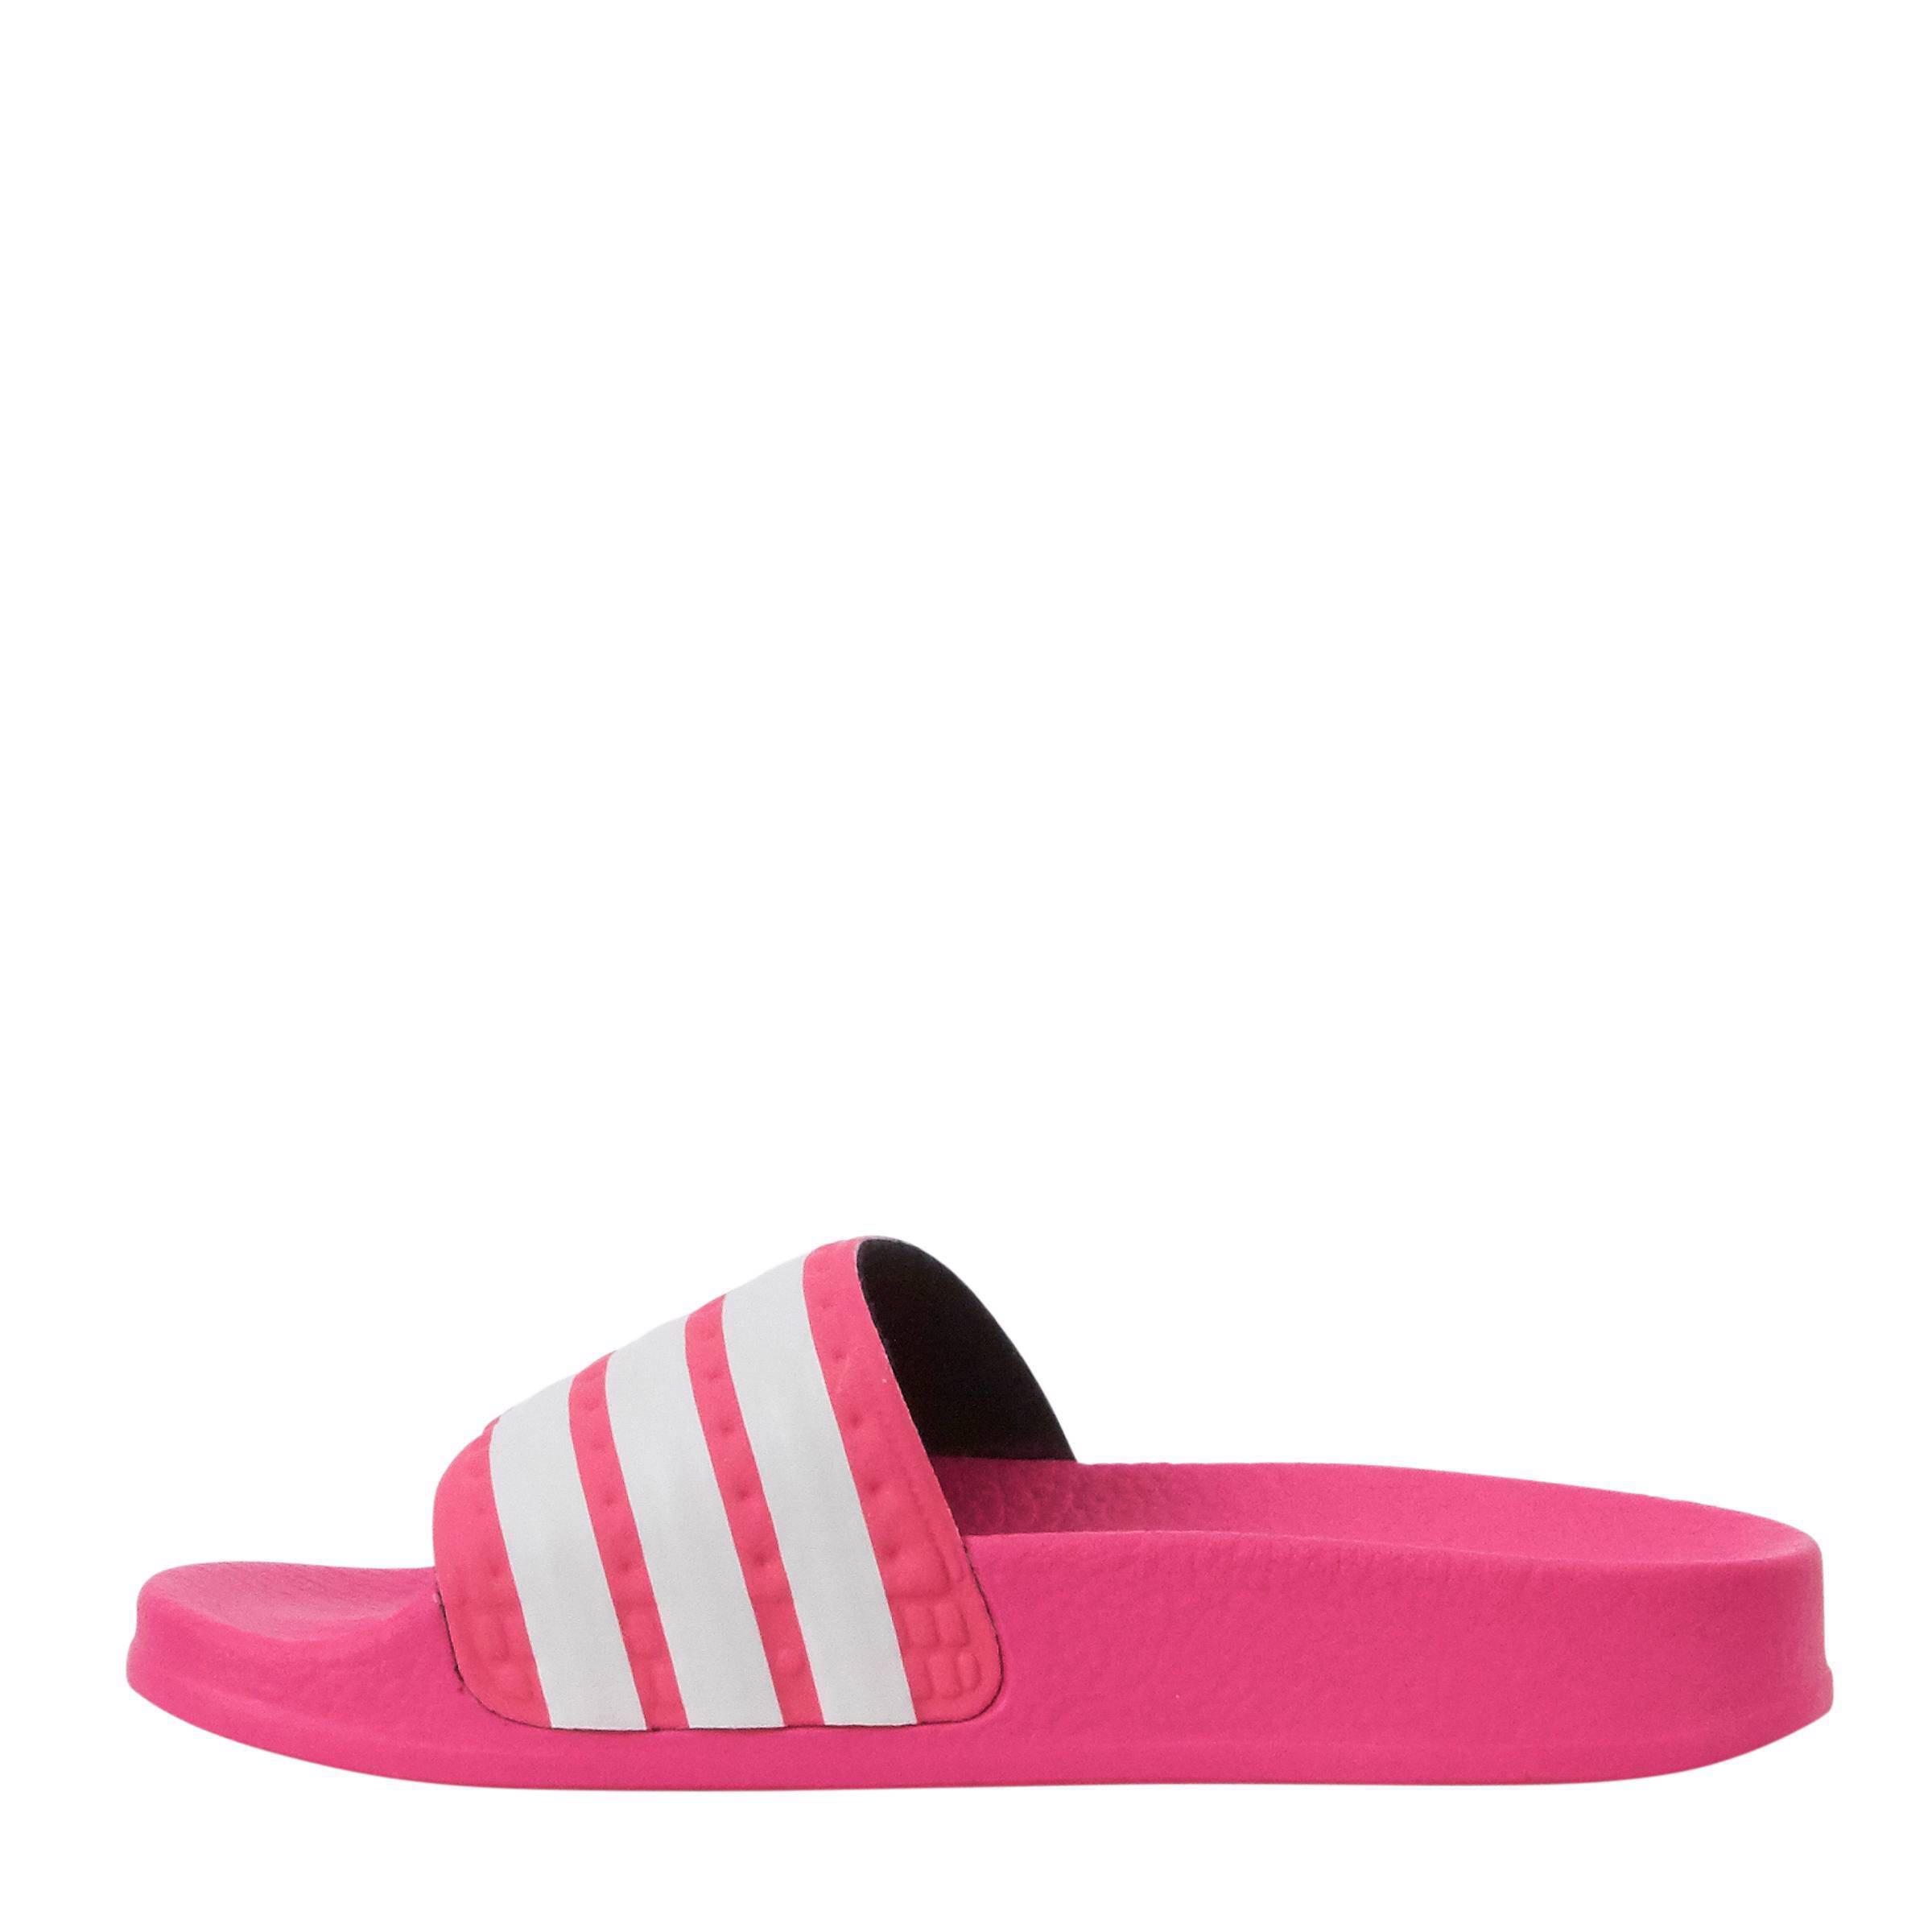 reputable site ba421 70aa6 adidas originals badslippers Adilette Kids  wehkamp